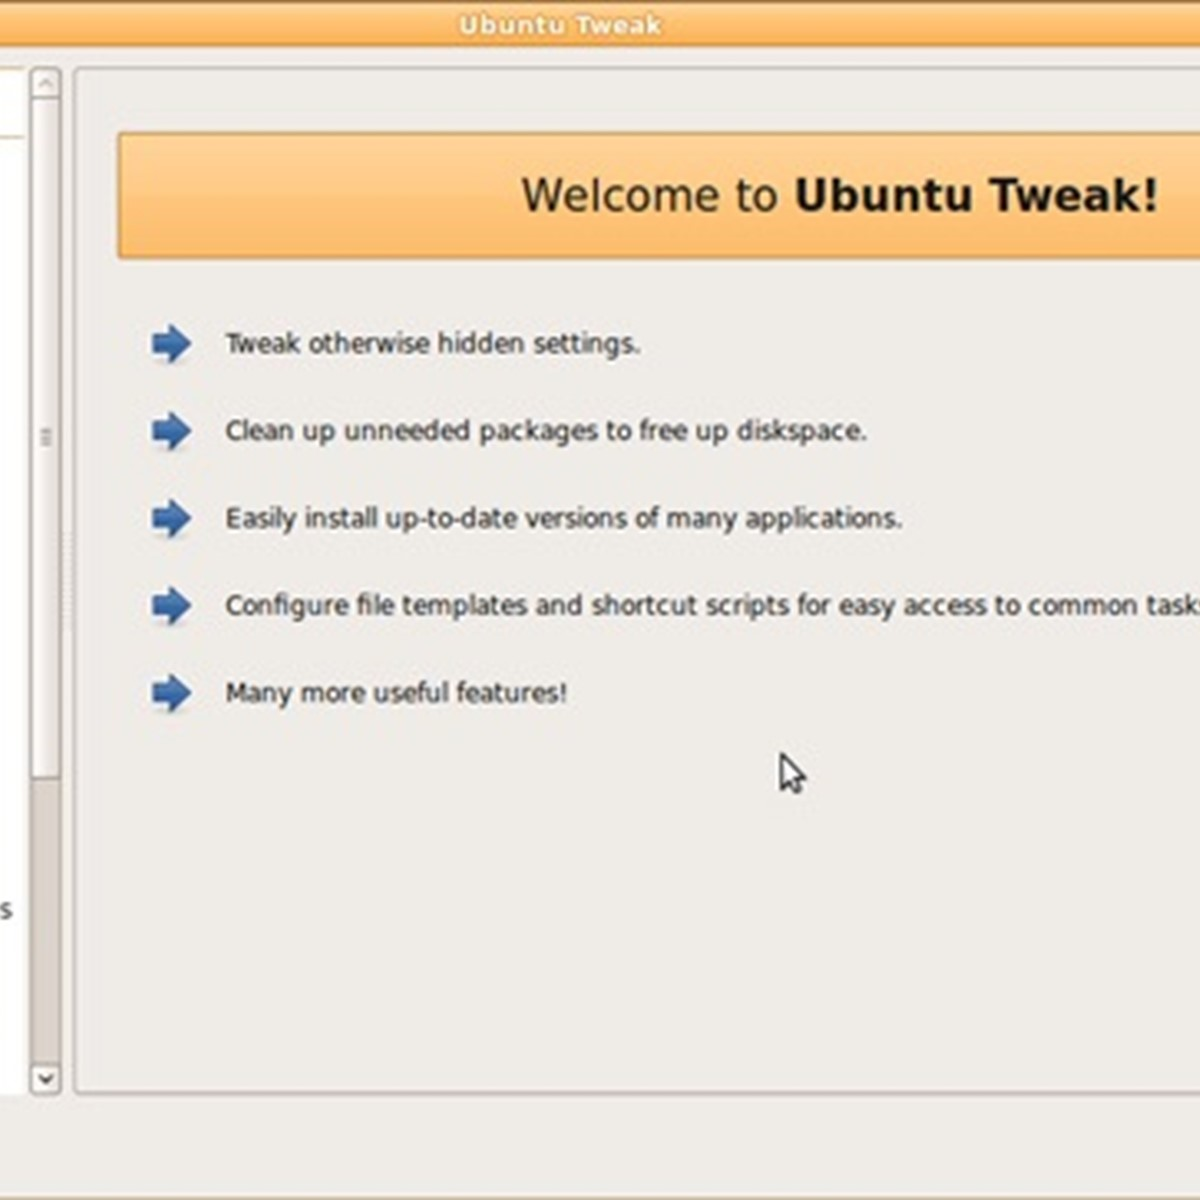 Ubuntu Tweak Alternatives and Similar Software - AlternativeTo net